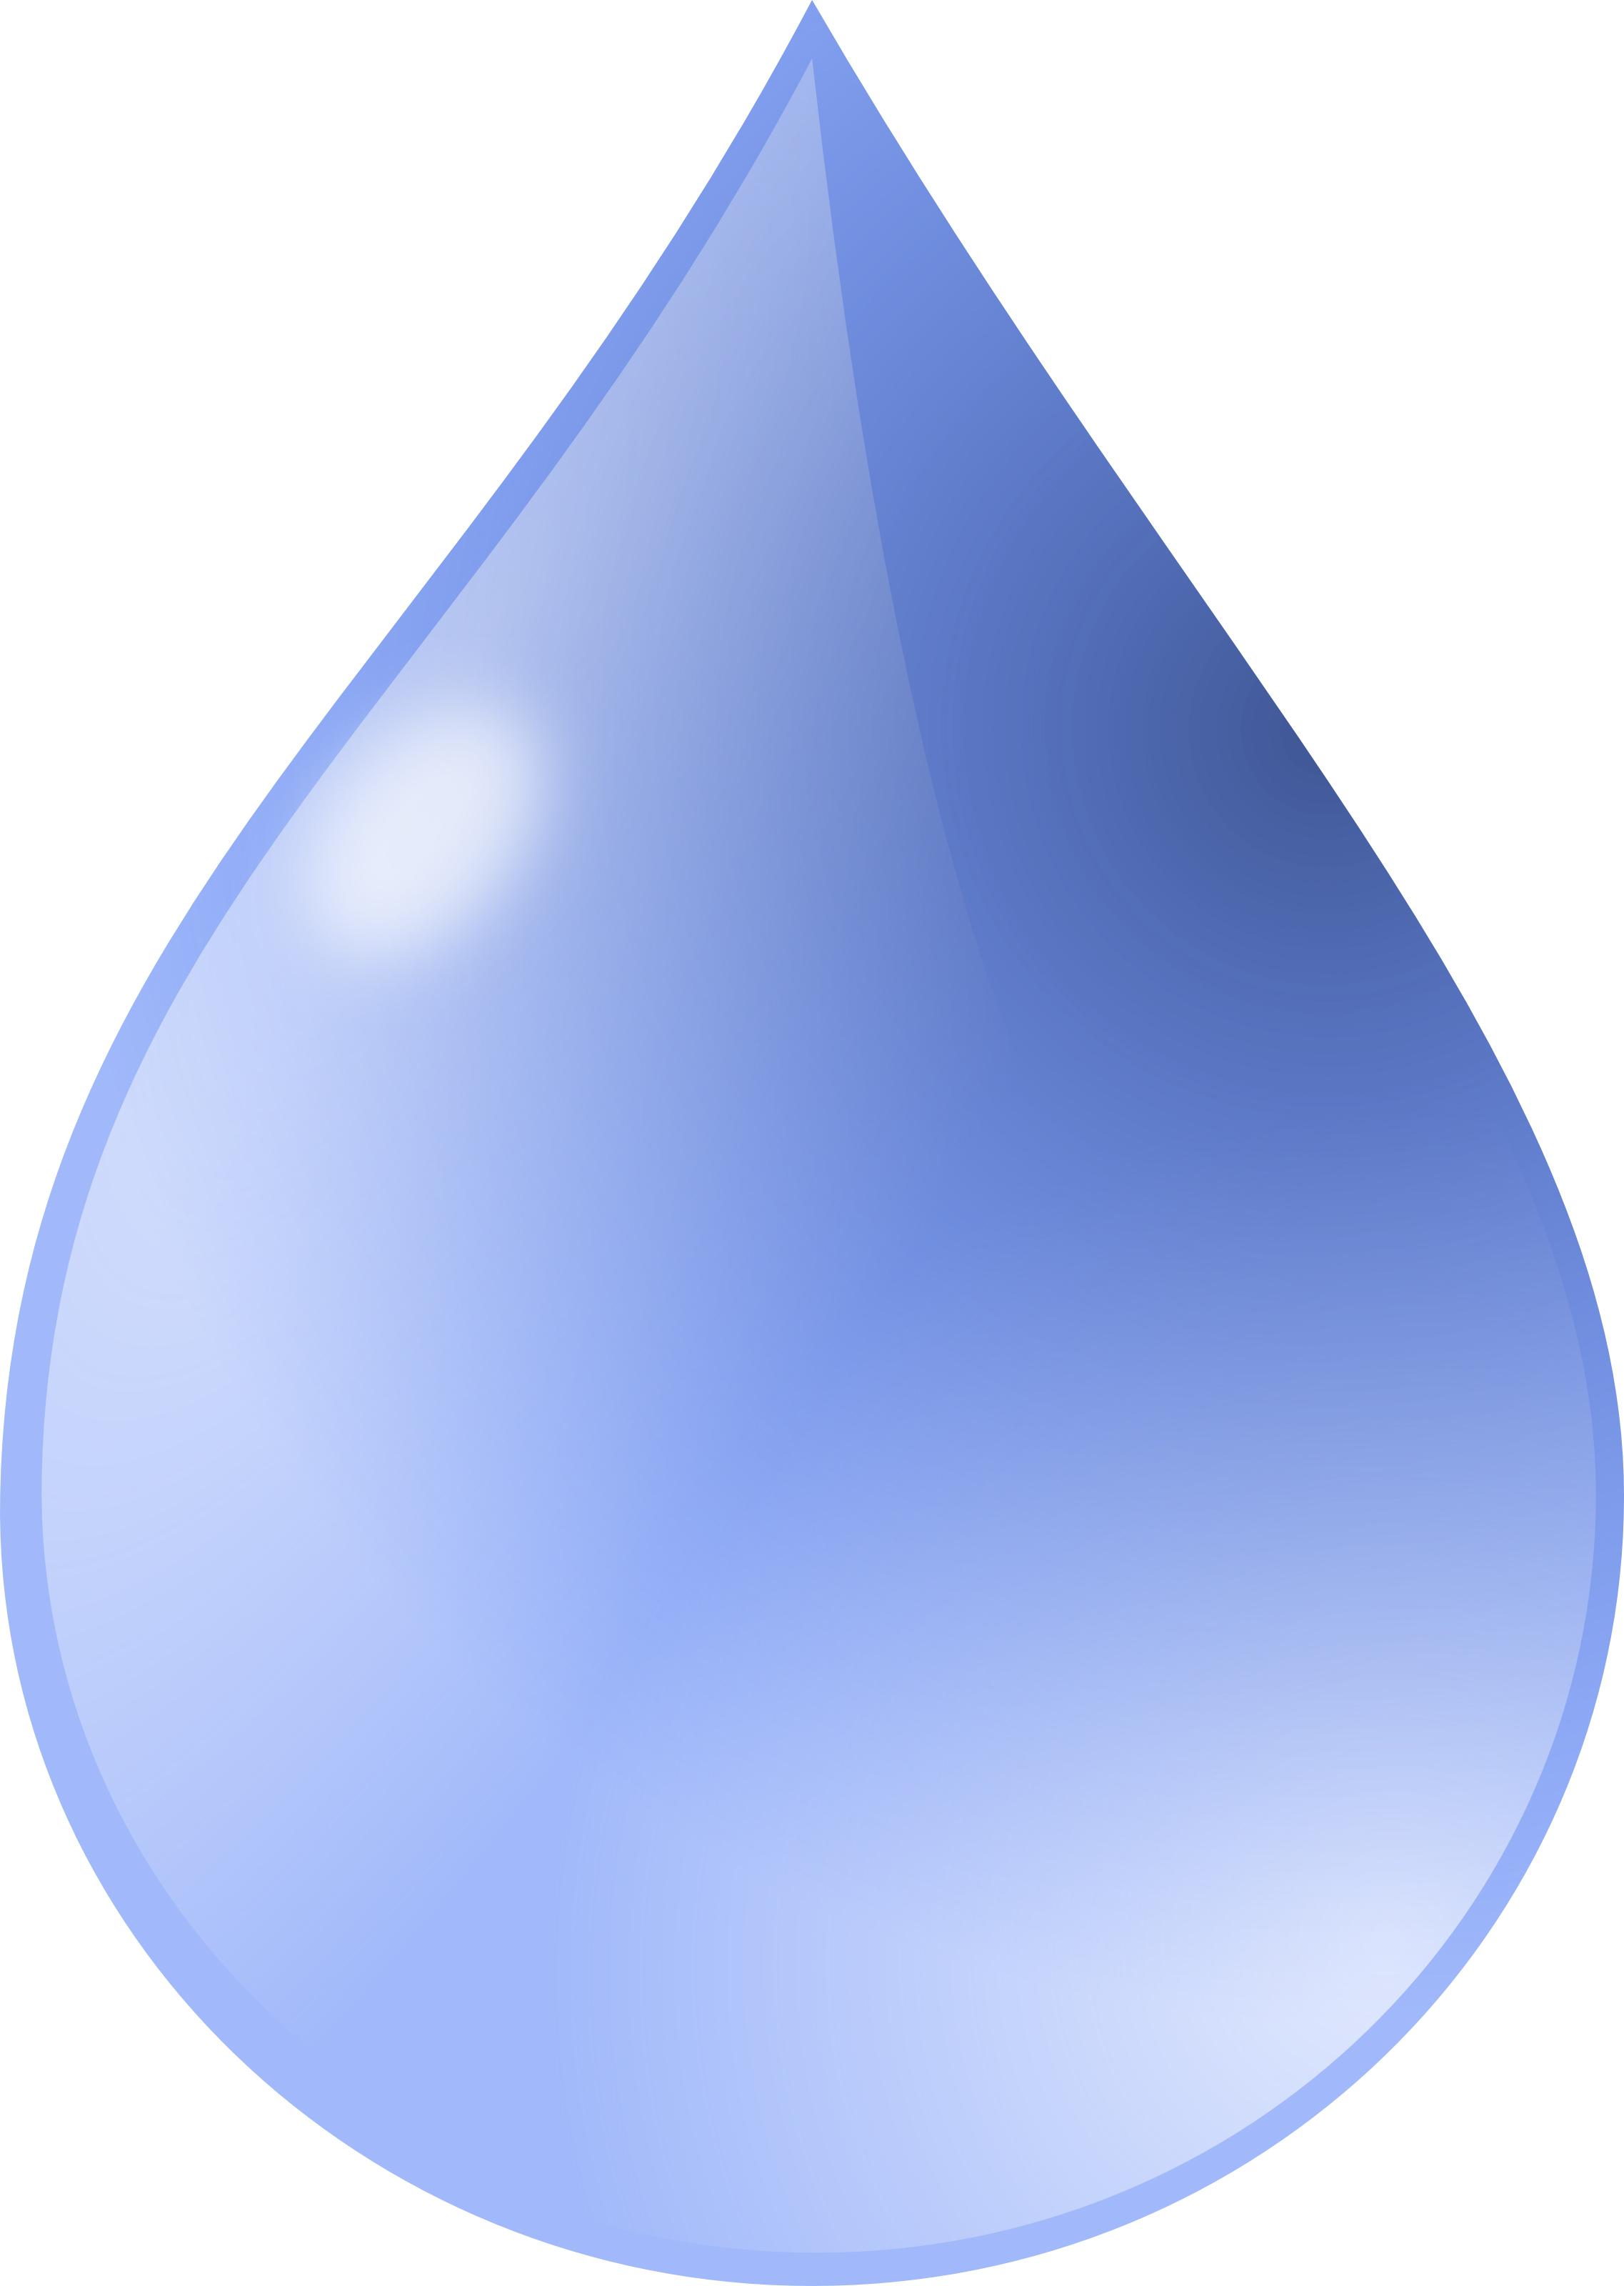 Transparent Water Drop Clipart.